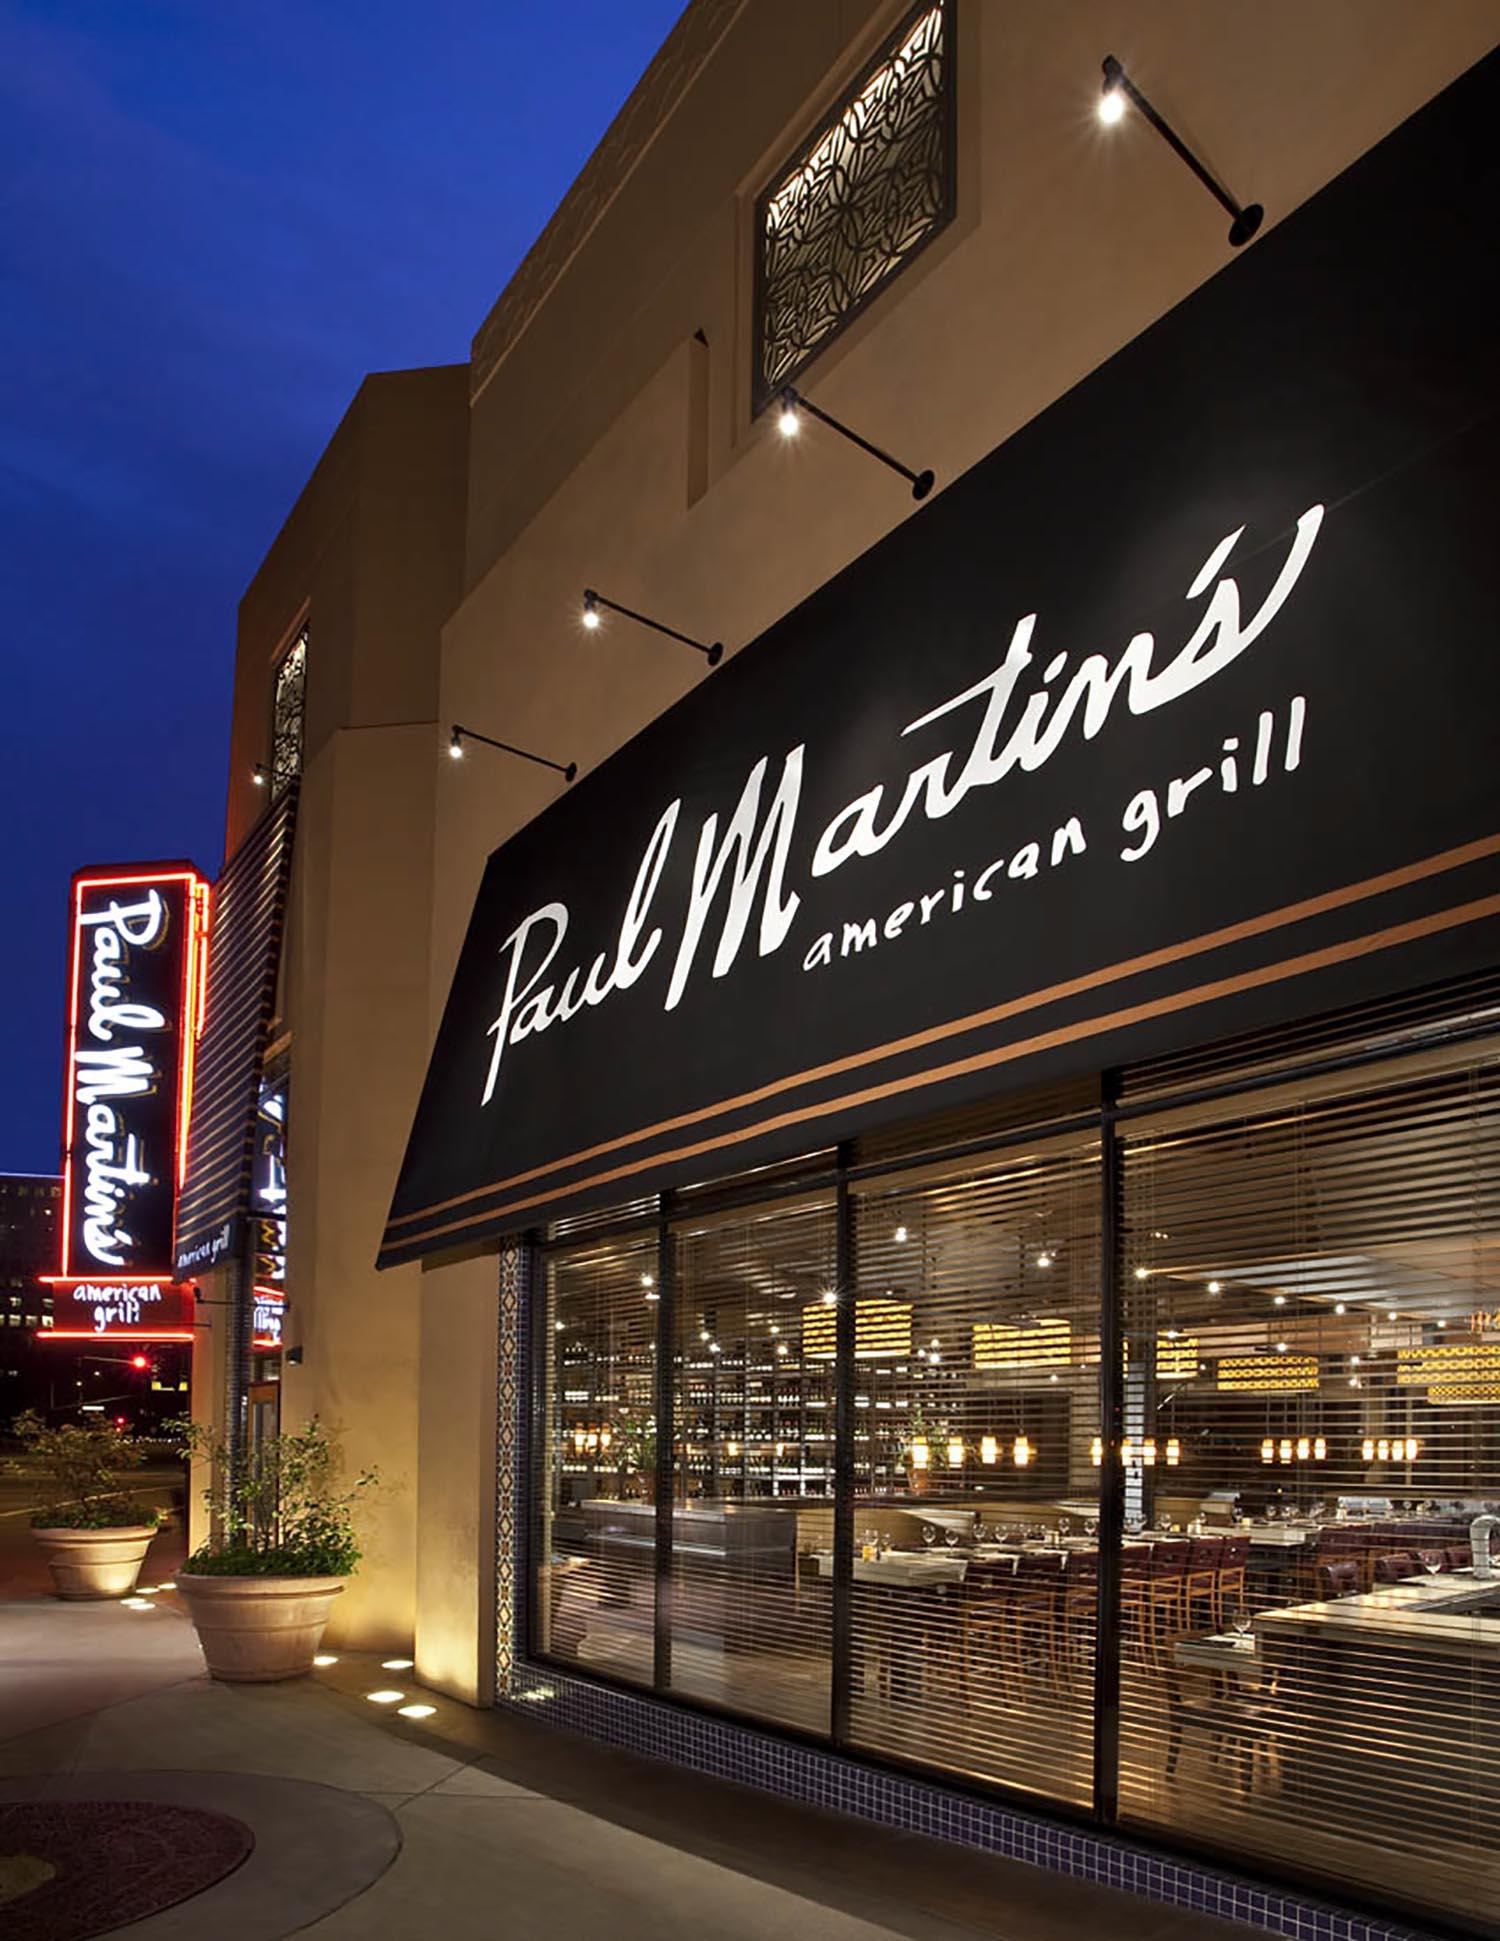 Irvine Restaurant Paul Martin S American Grill